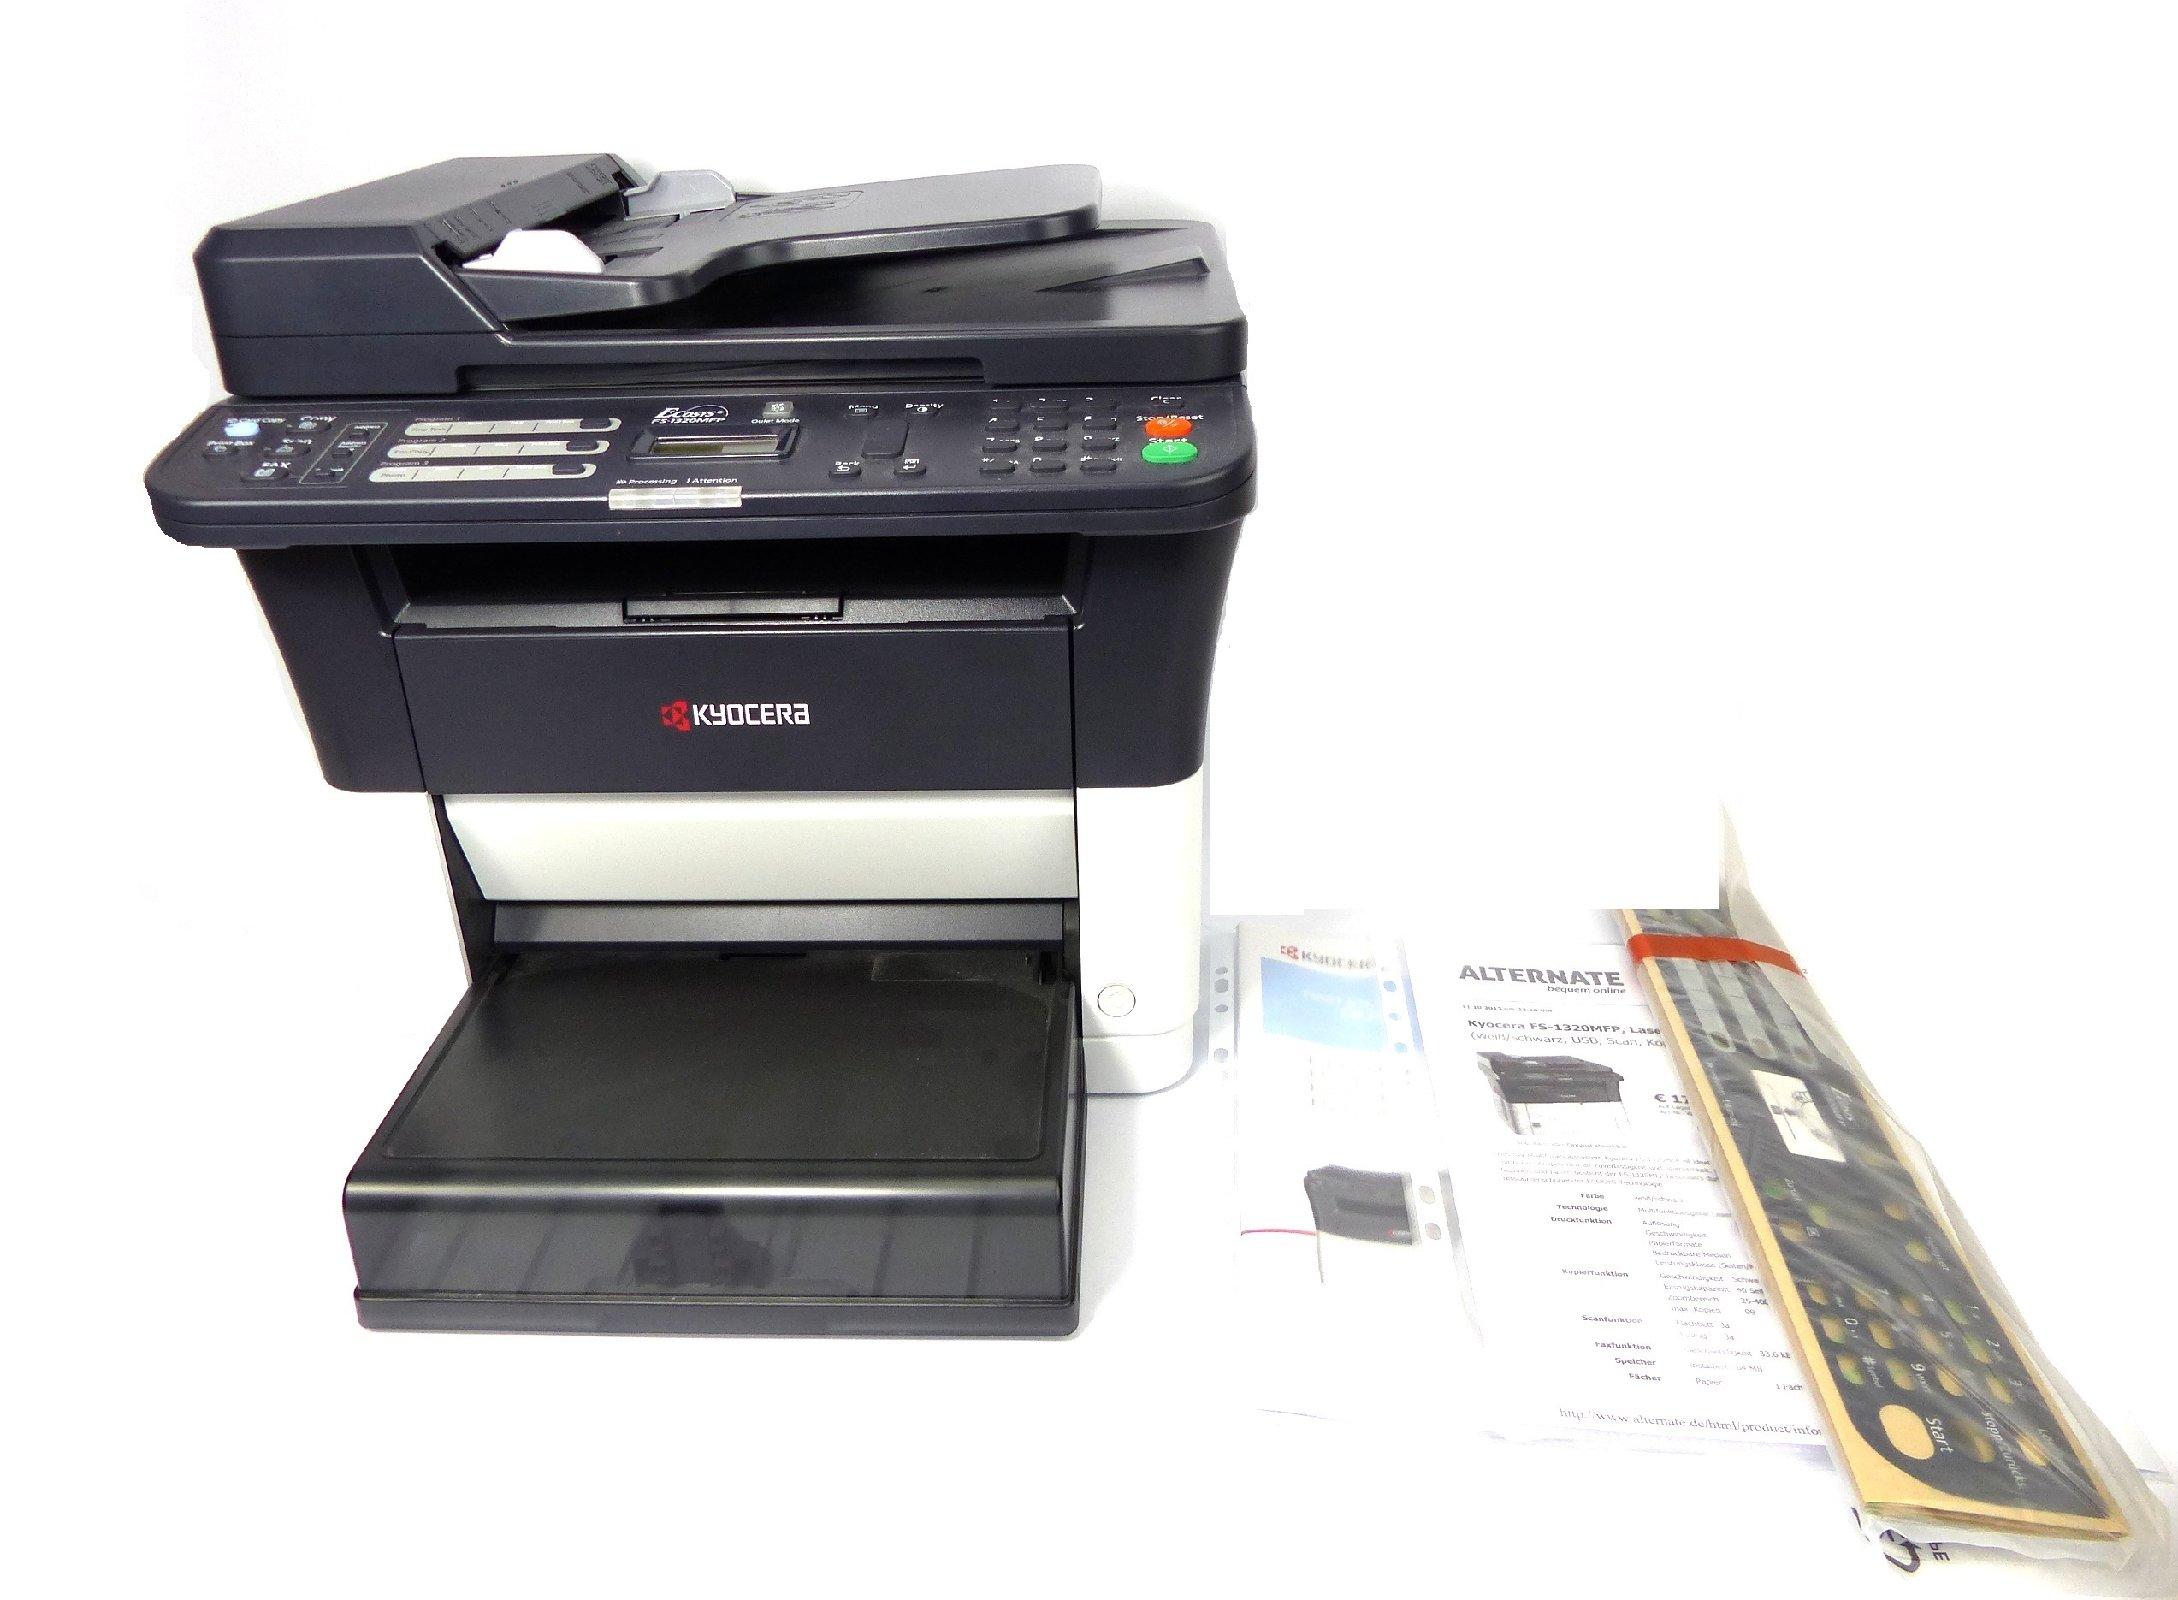 laserdrucker kyocera fs 1320mfp multifunktionsdrucker. Black Bedroom Furniture Sets. Home Design Ideas